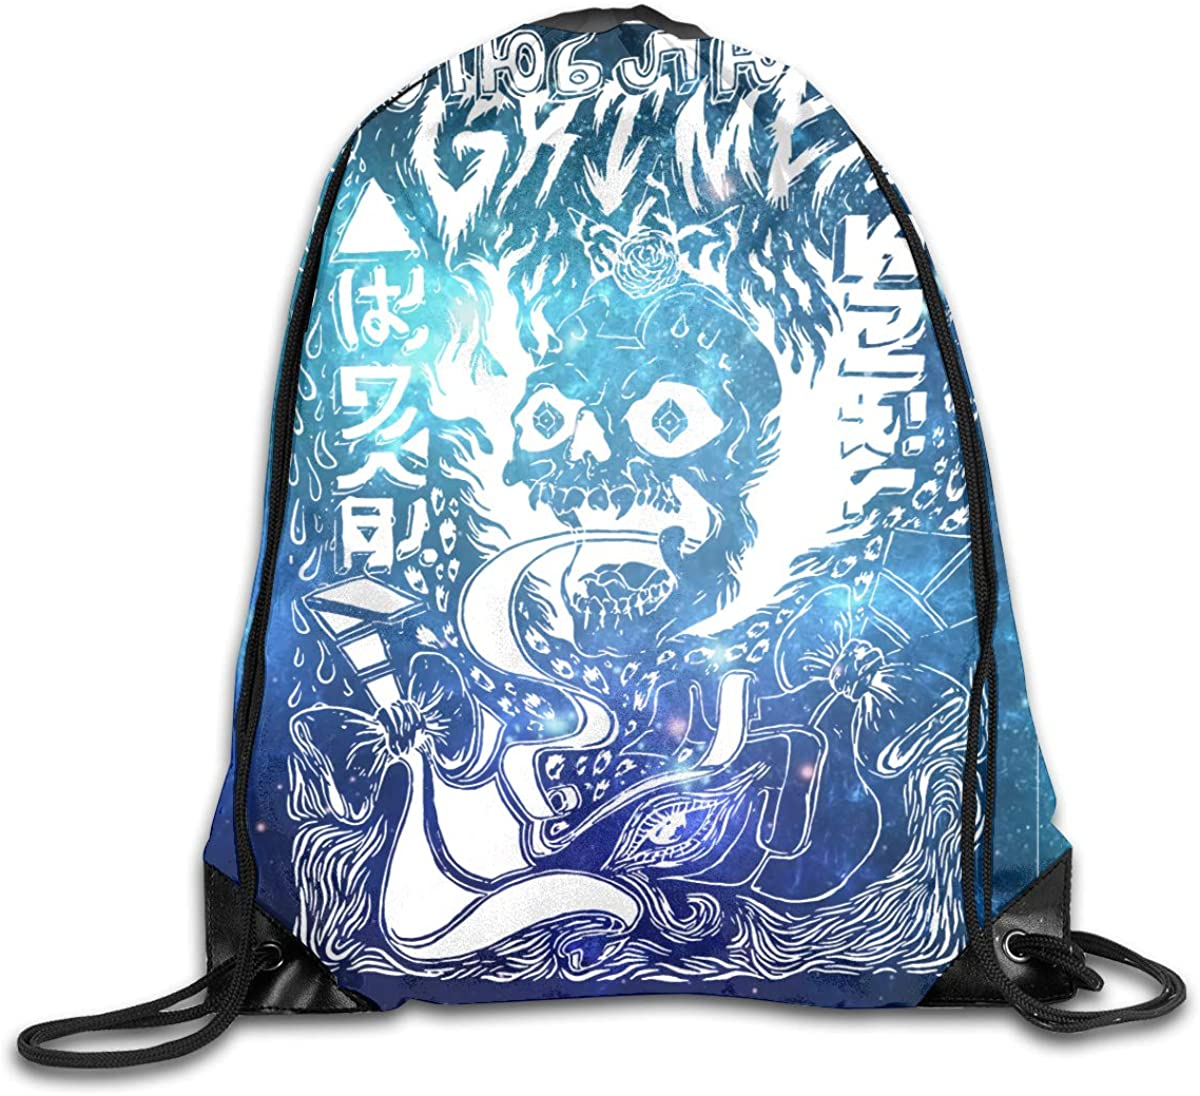 CAOI UUC Grimes Visions Gym Drawstring Backpack Cinch Sack